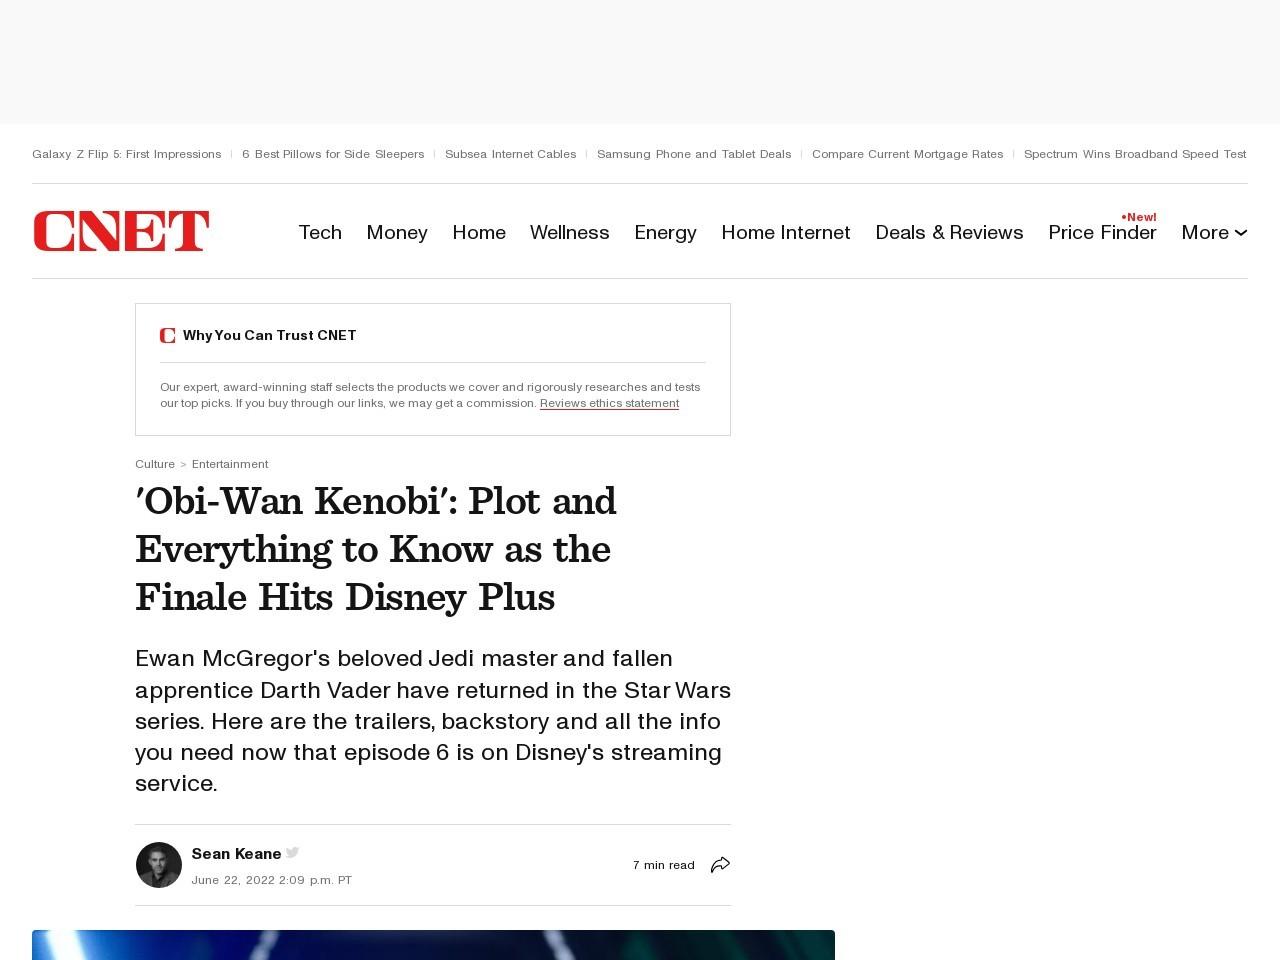 Star Wars on Disney Plus: Everything we know about the Obi-Wan Kenobi TV show     – CNET